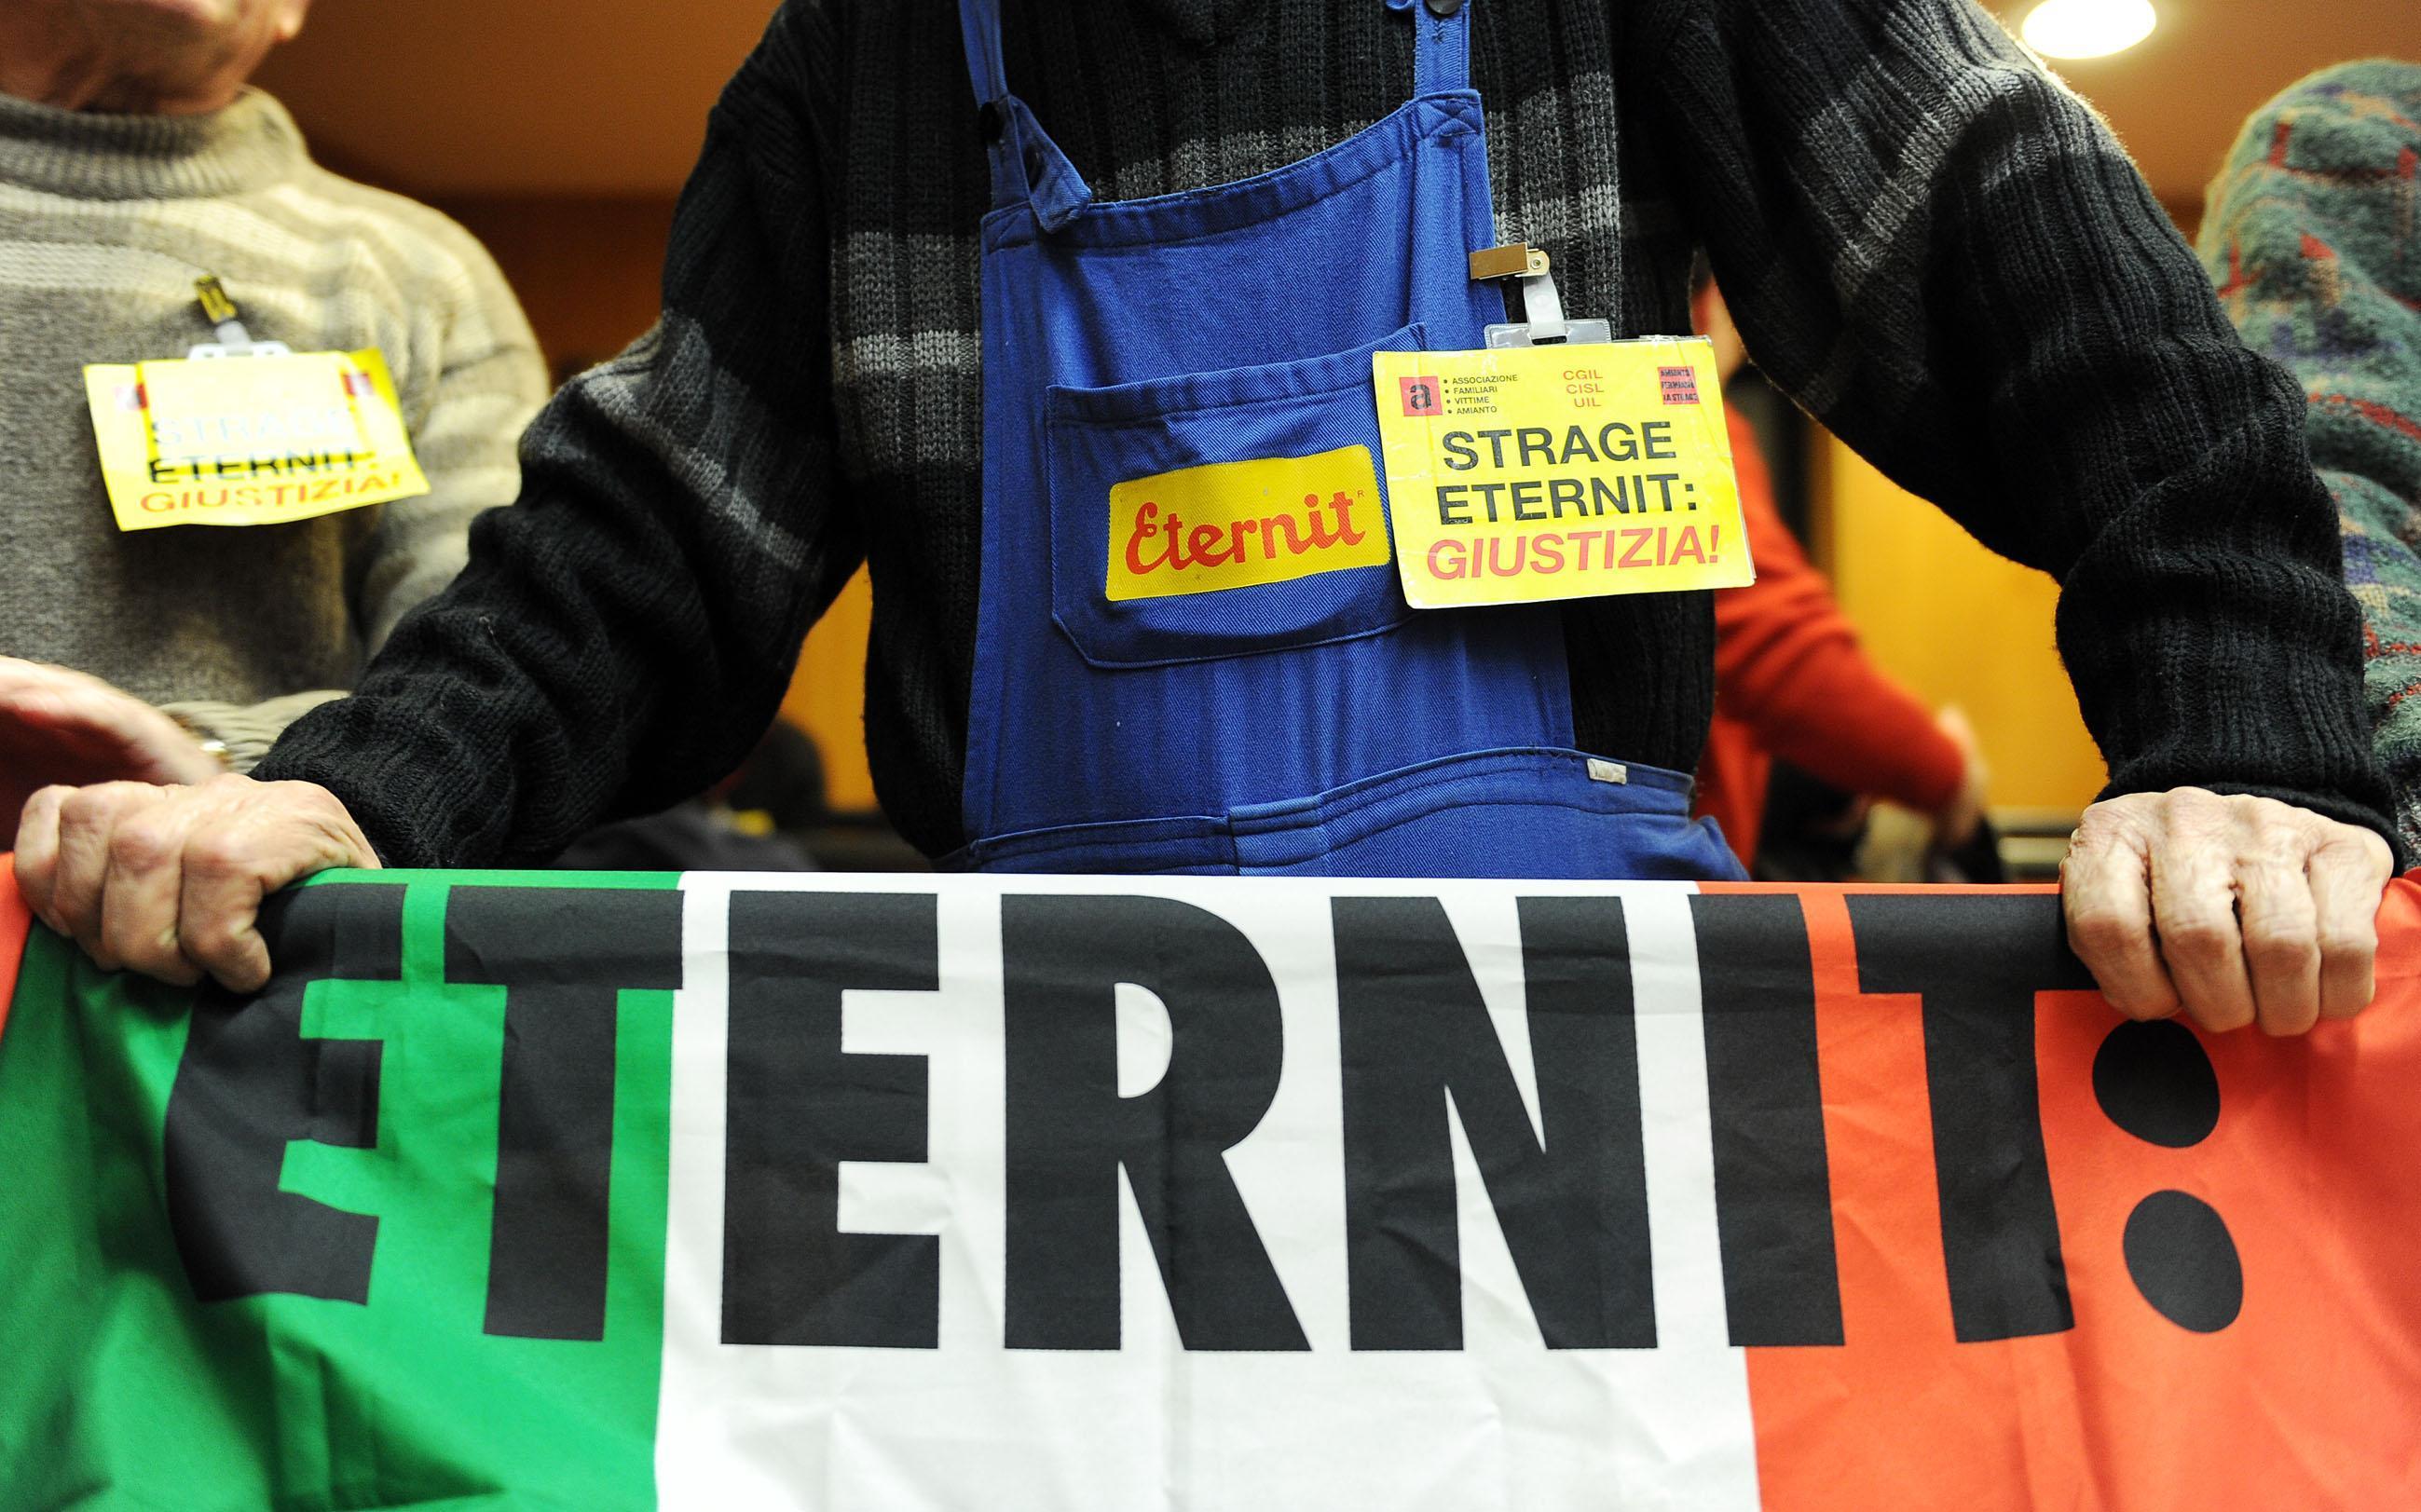 Eternit: Cassazione, i processi restano spacchettati